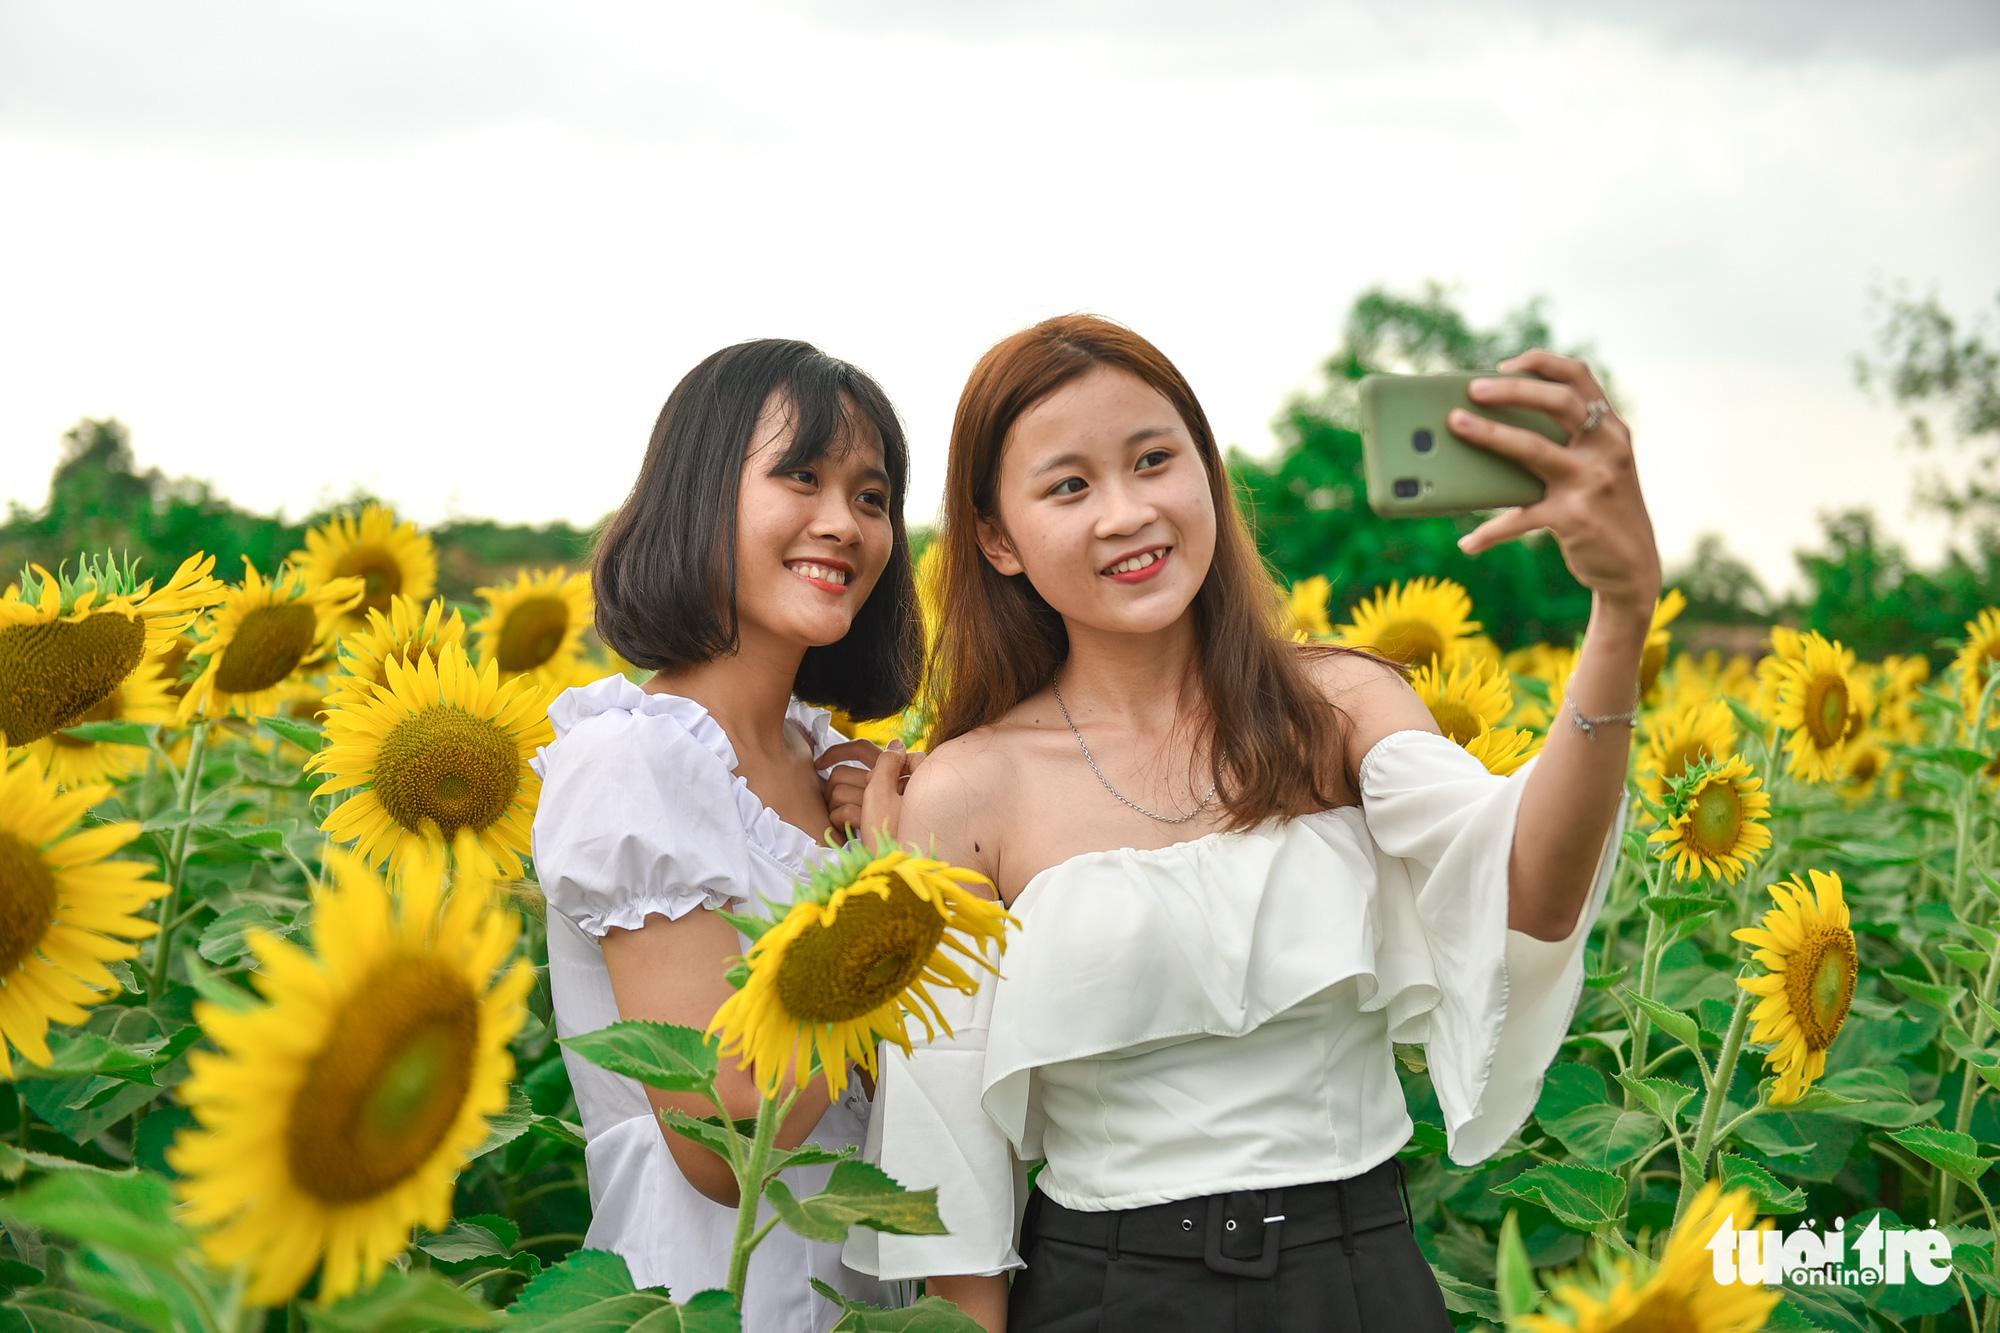 Dazzling sunflower garden draws photo seekers on Saigon outskirts